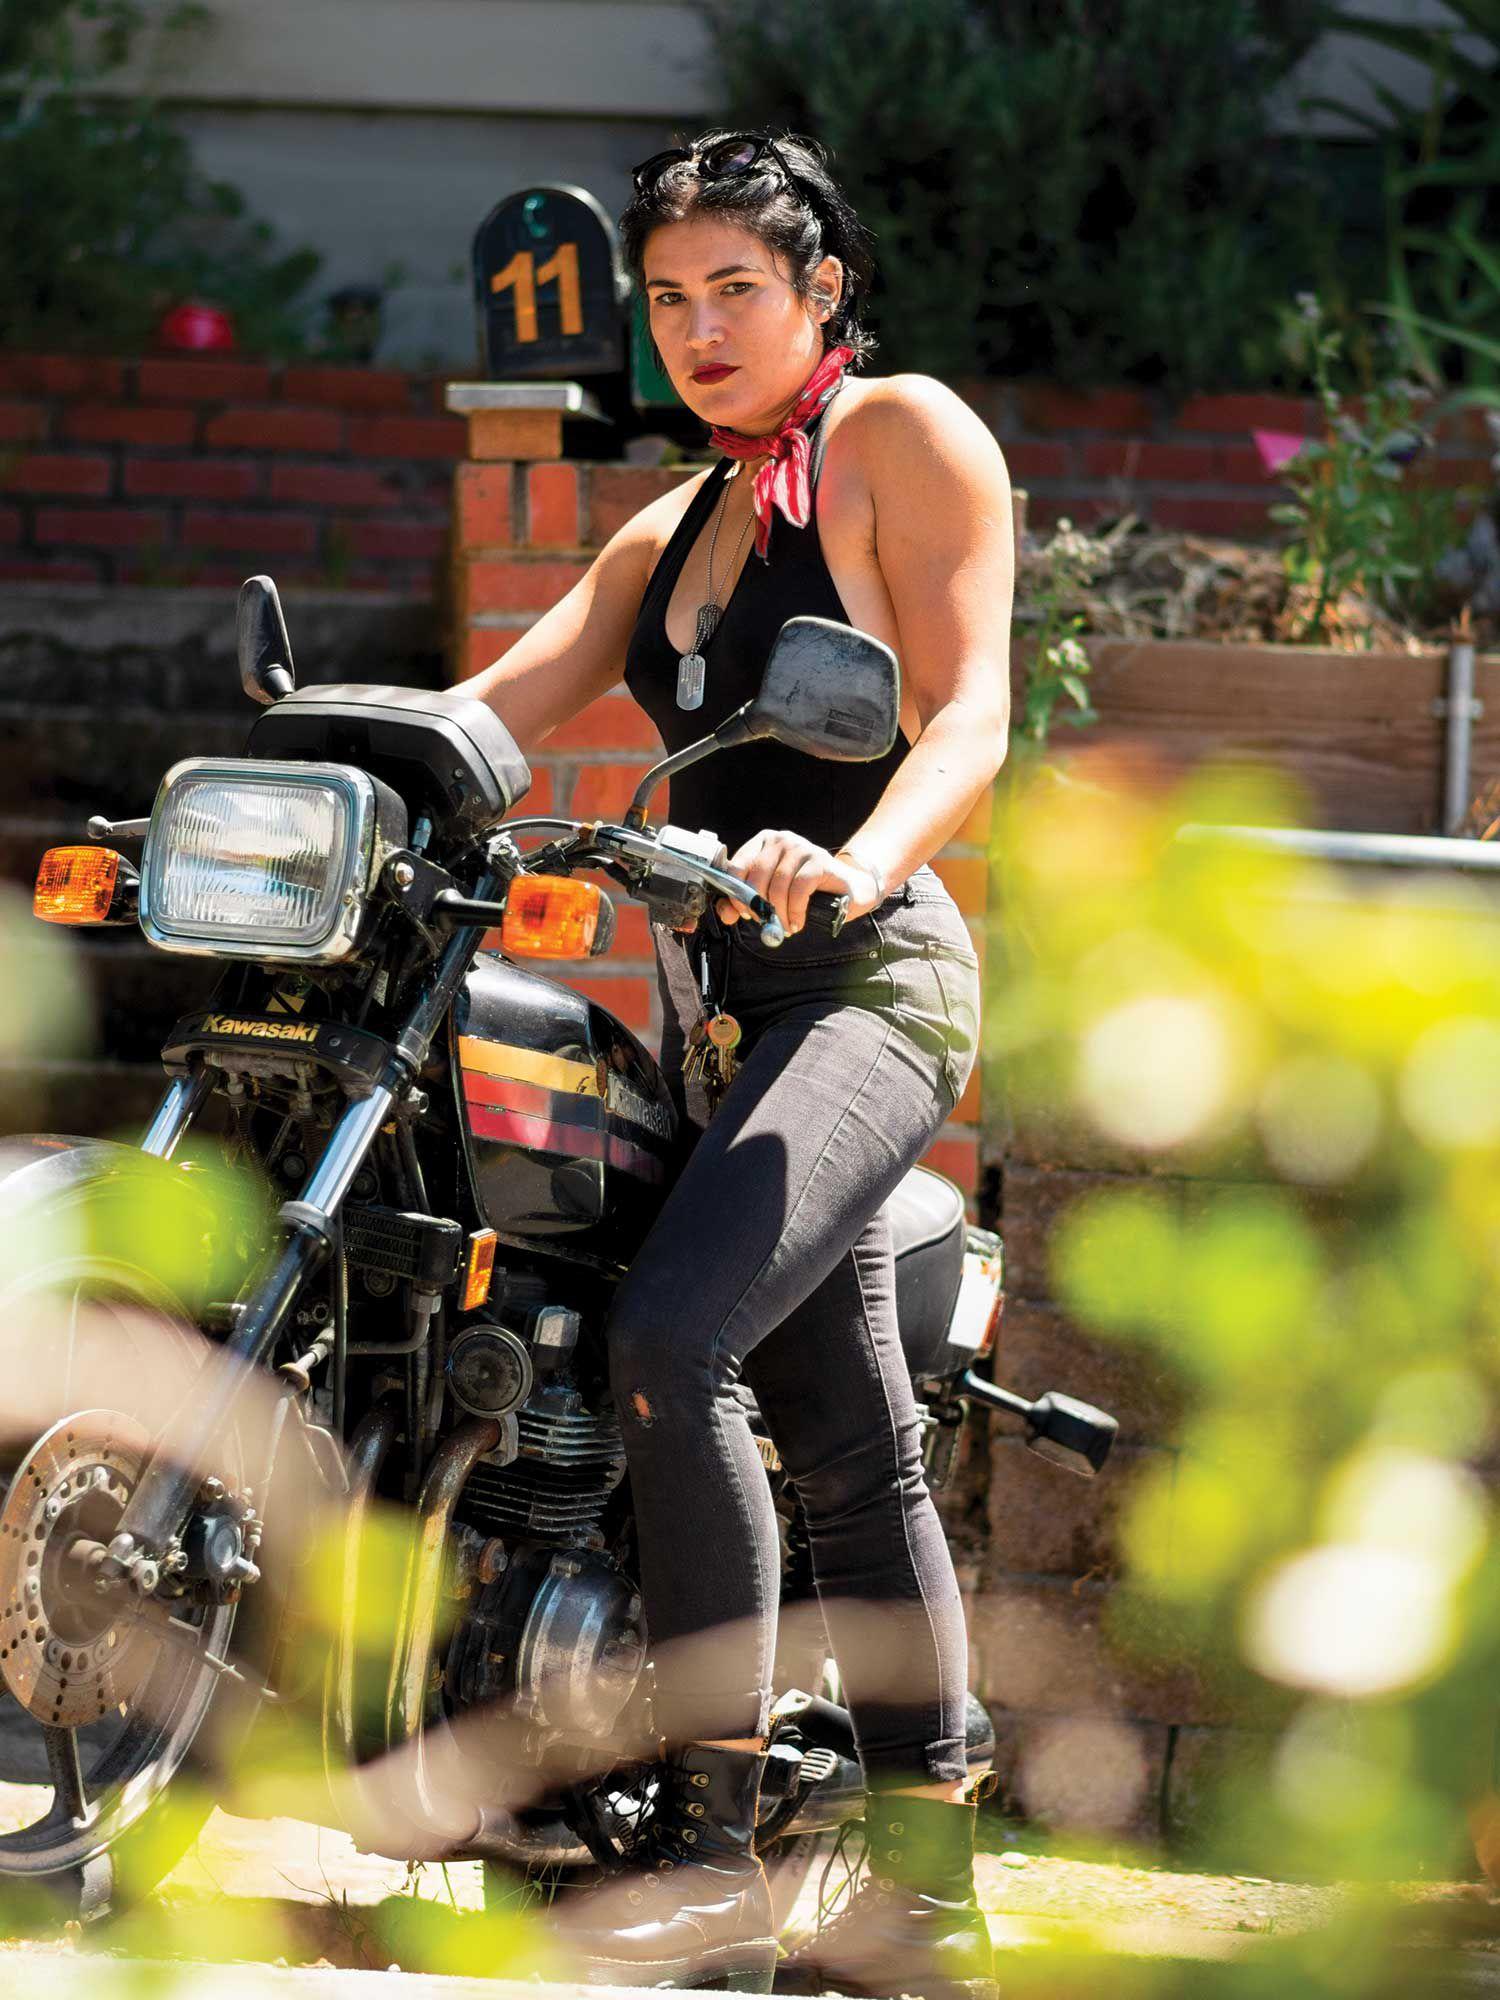 California opera singer, Nikola Printz tells her story of how she got into motorcycling.